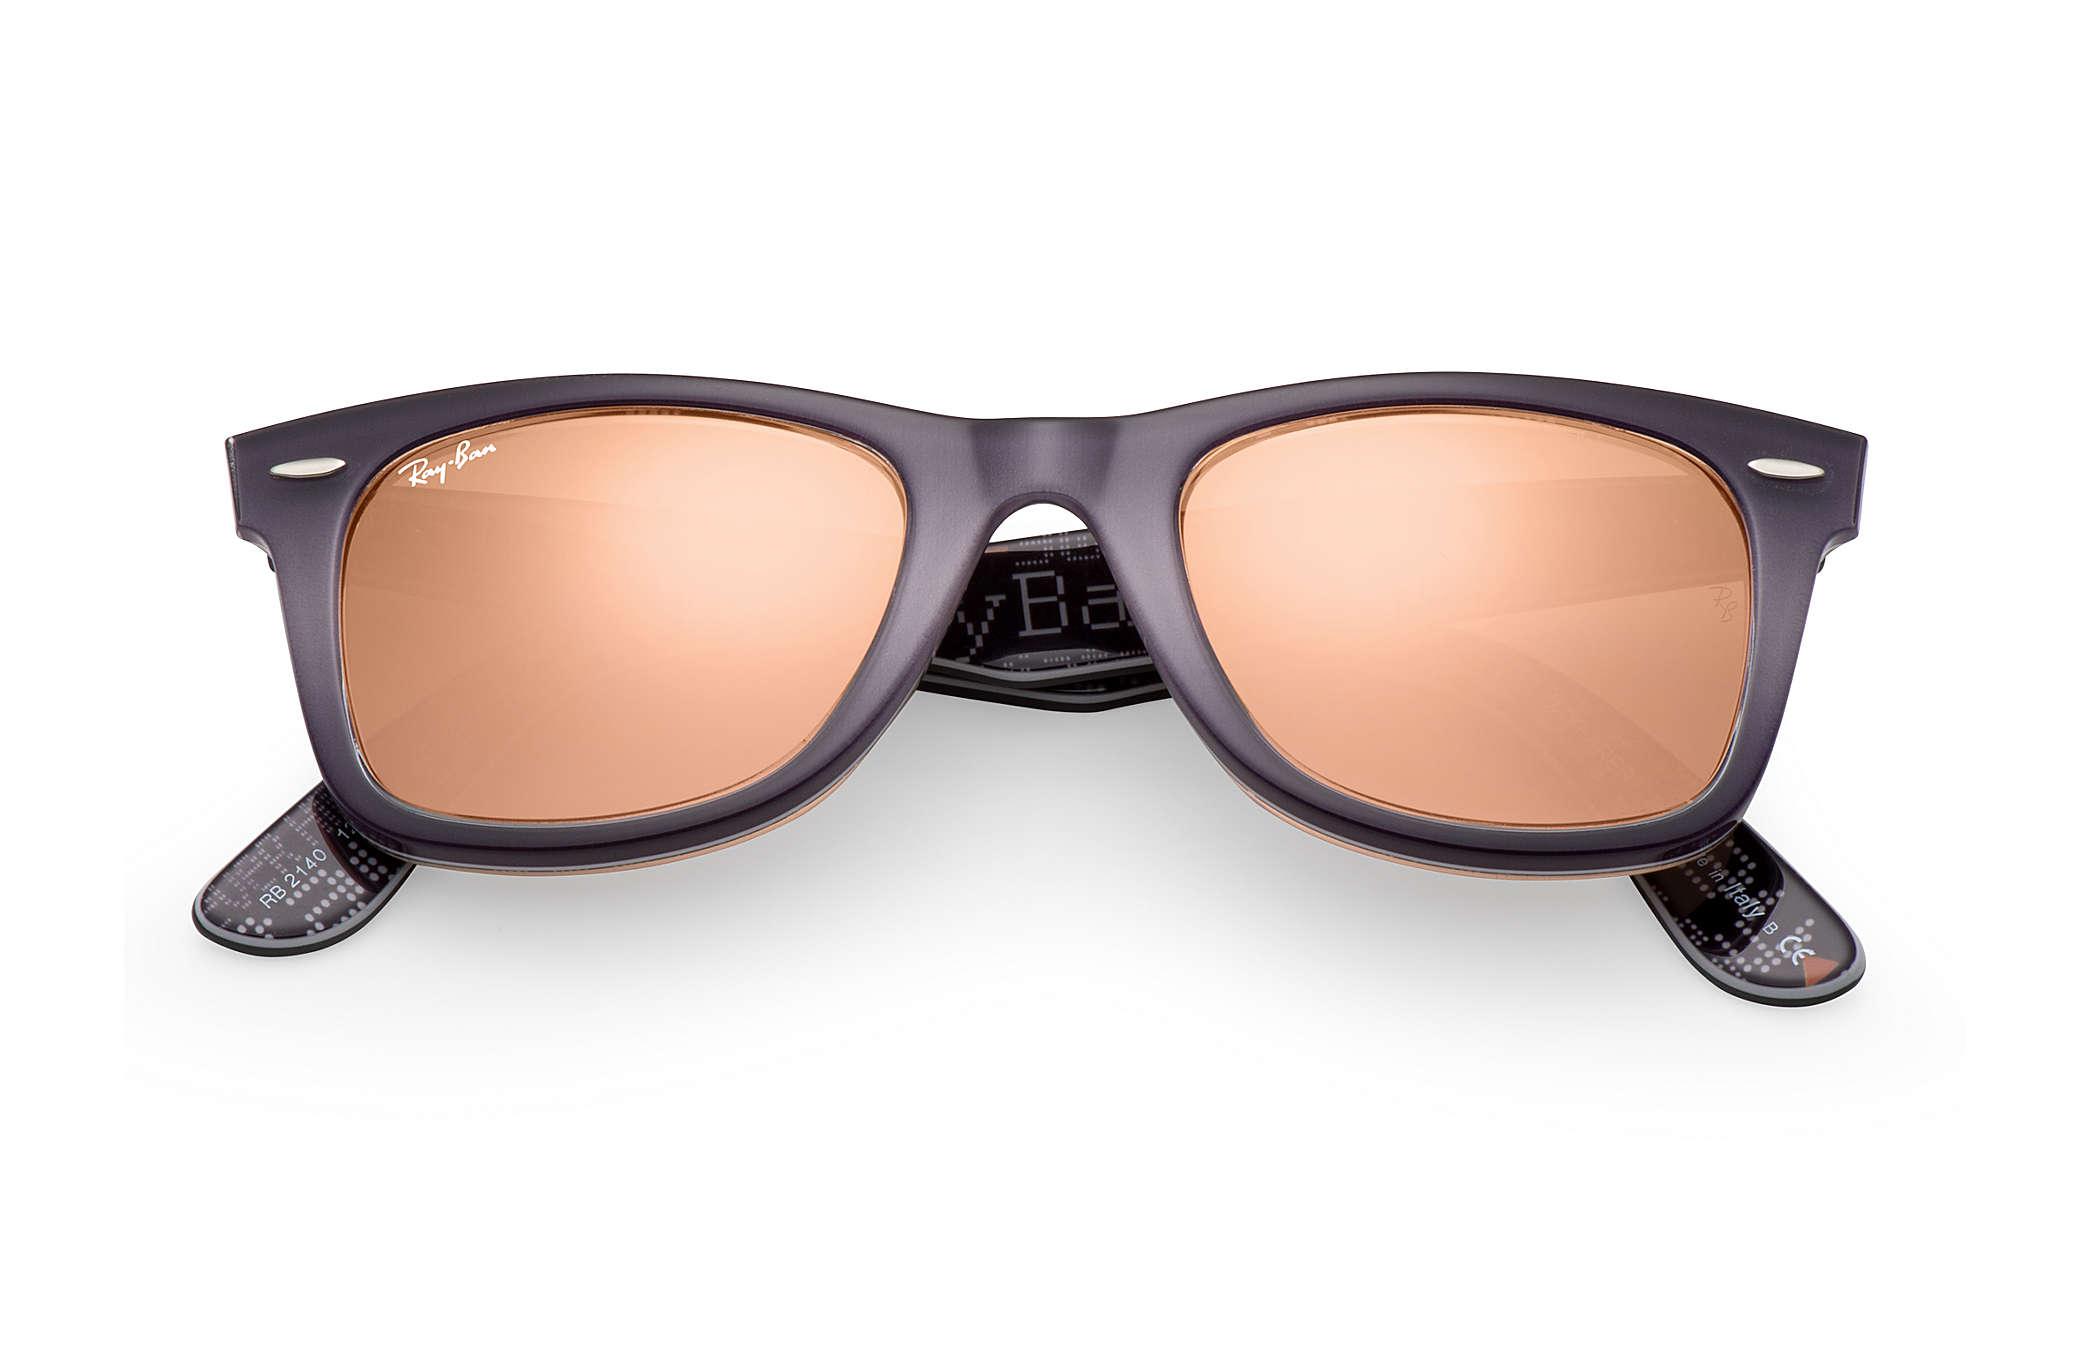 ... Ray-Ban 0RB2140-ORIGINAL WAYFARER PIXEL Gris,Multicolor   Noir,Multicolor SUN ... 479a81ed4557